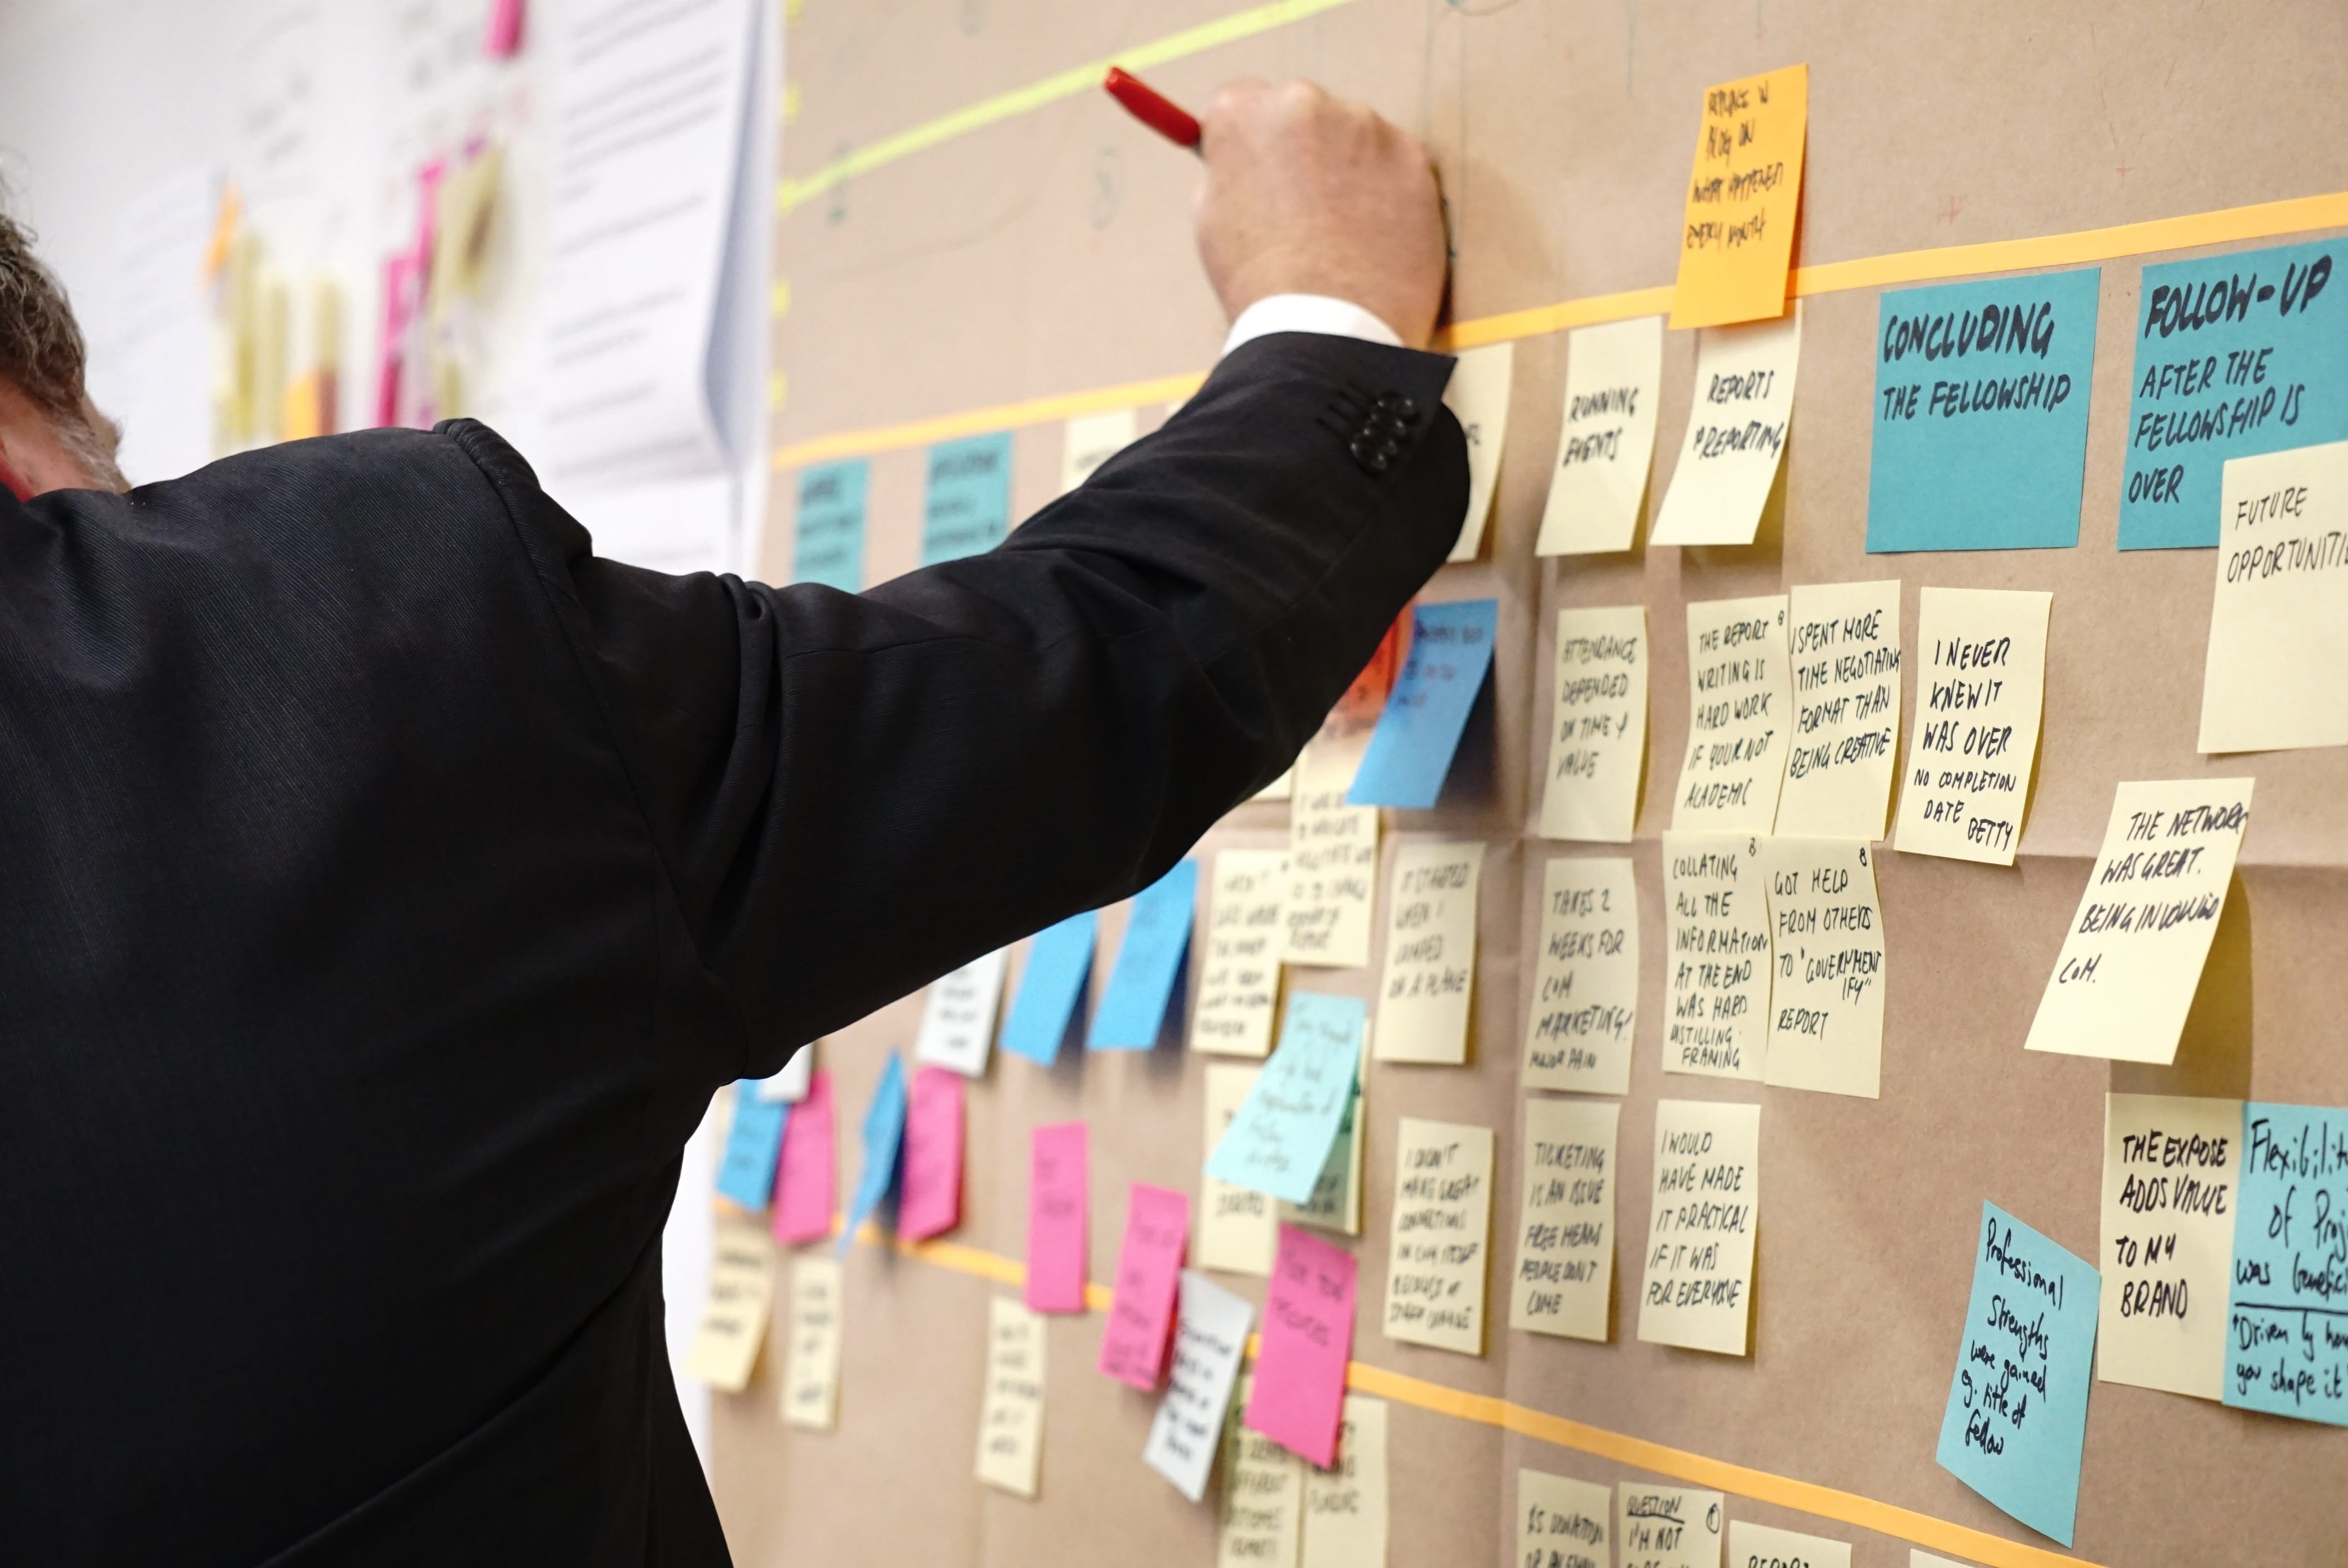 Man working at a bulletin board full of sticky notes; image by Jo Szczepanska, via Unsplash.com.